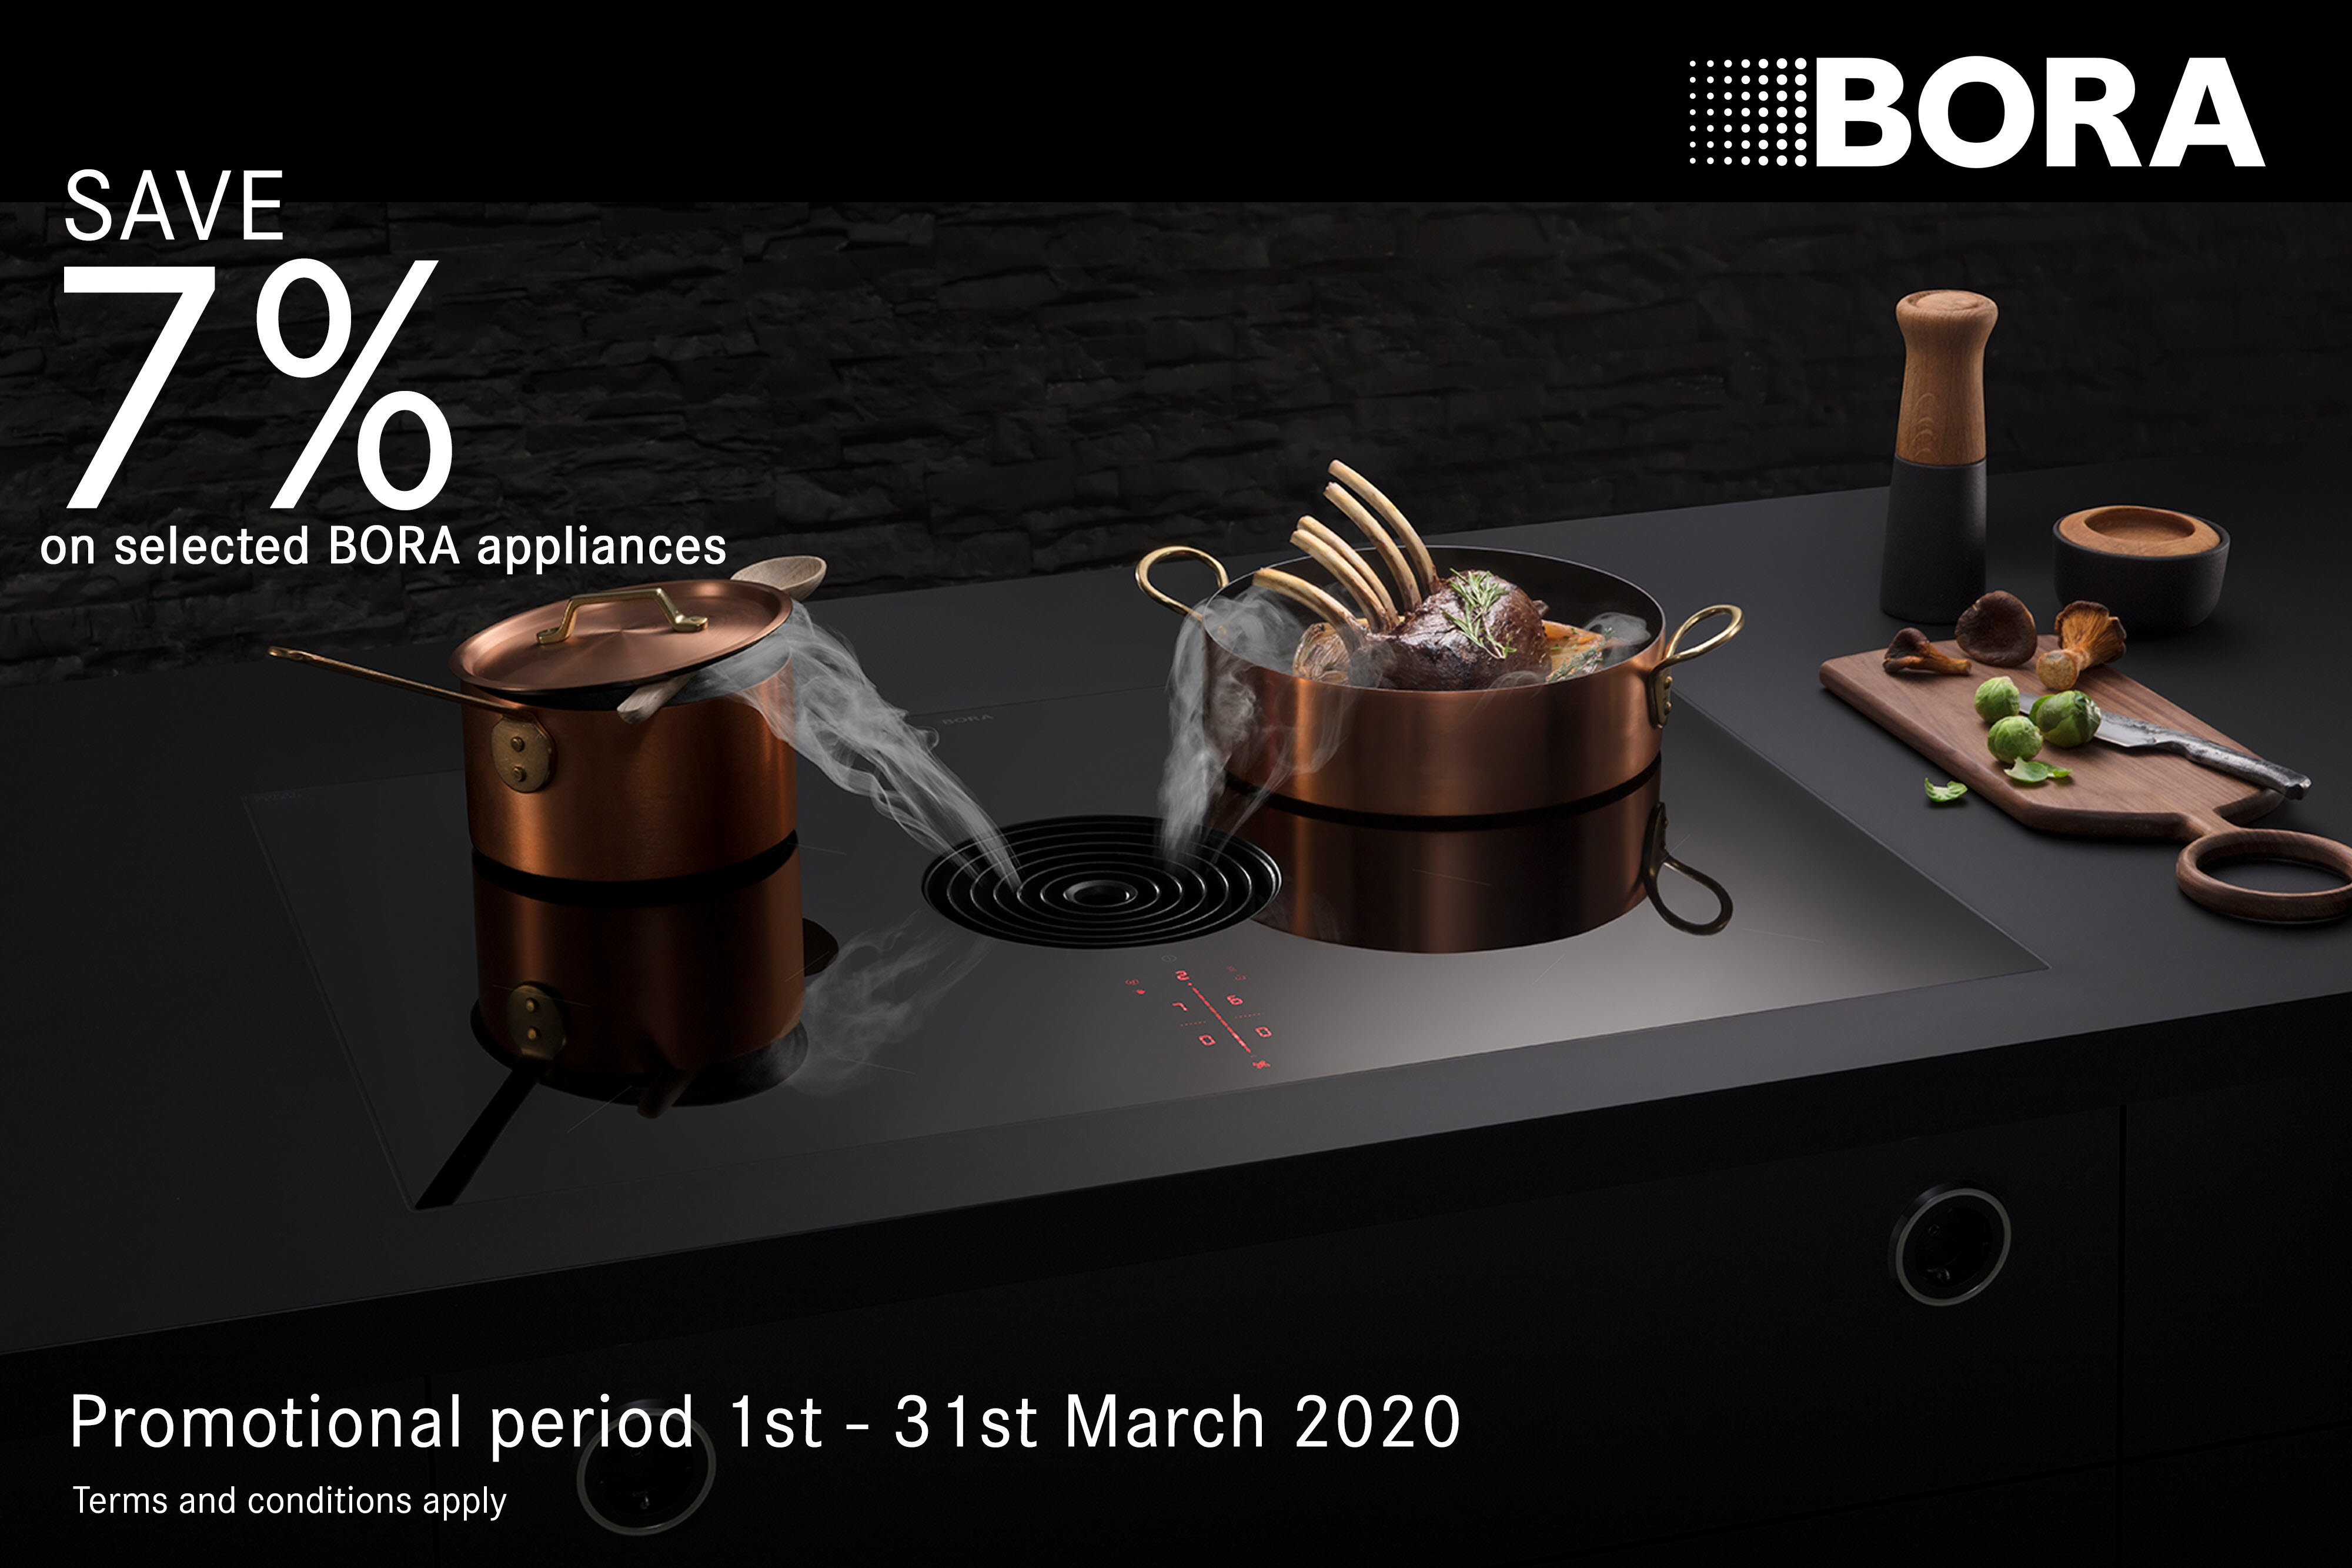 BORA 7% Classic March 2020 Promotion